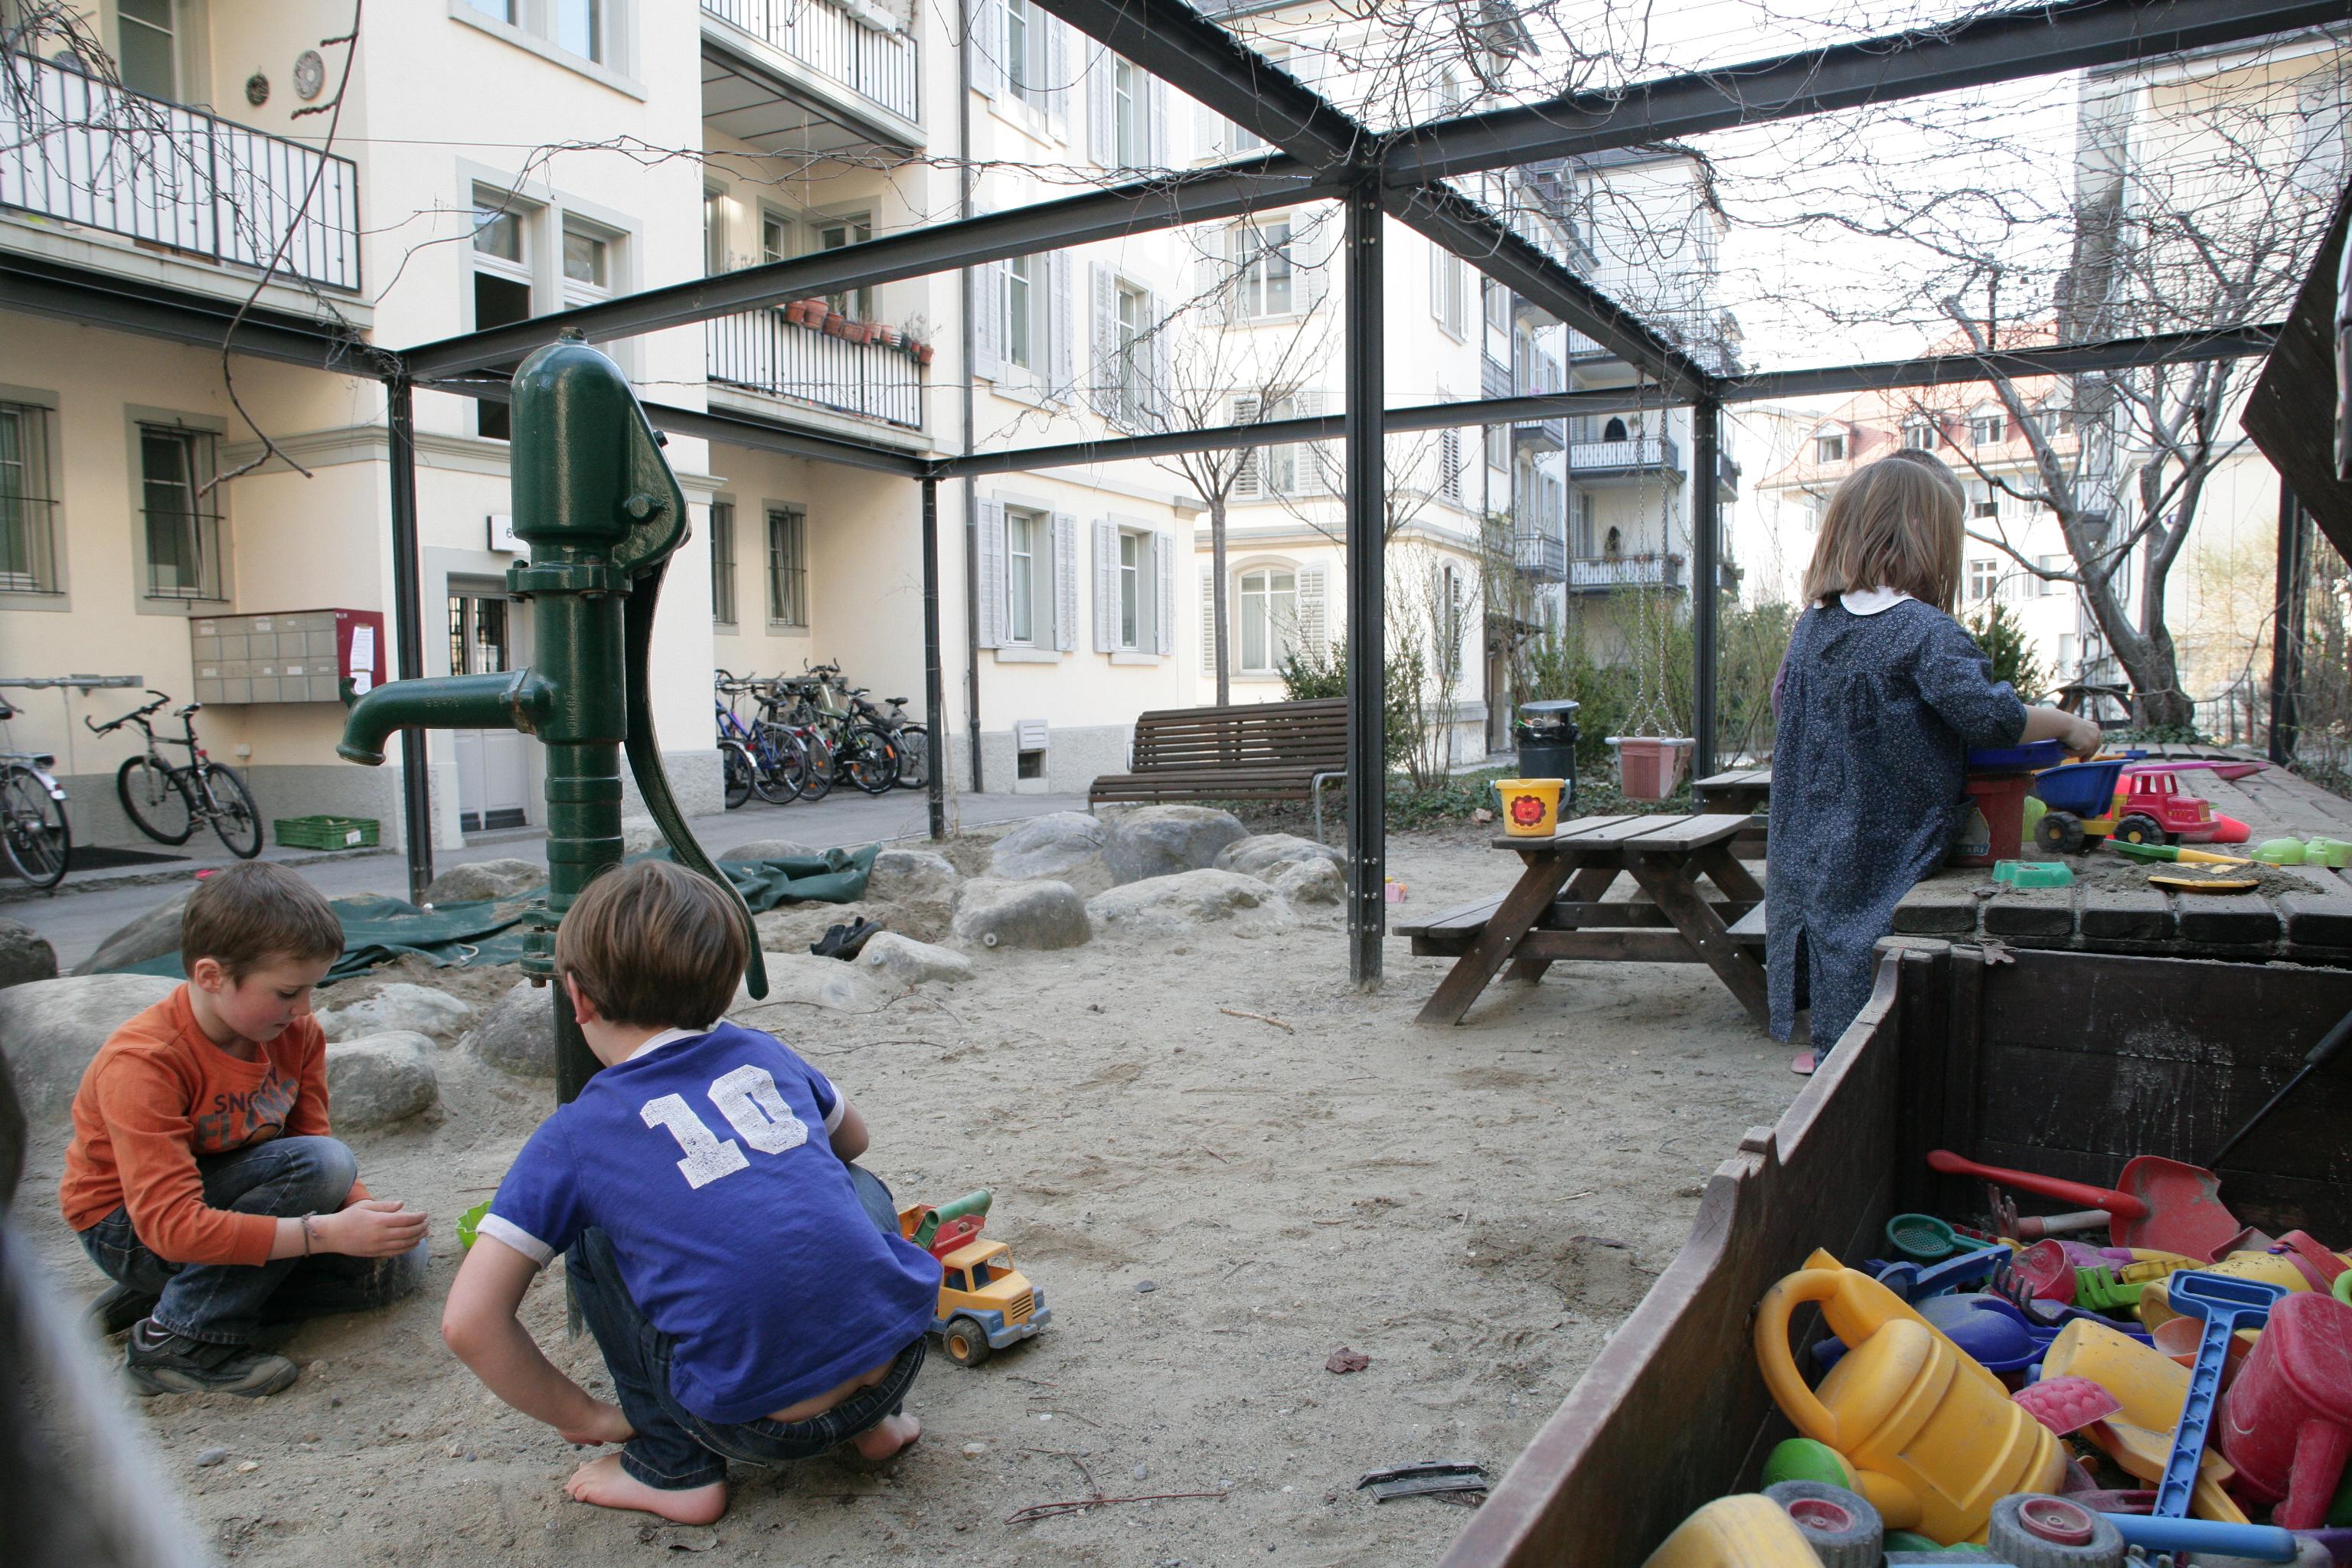 Cooperativa di abitazione wohnen for Tipi di abitazione